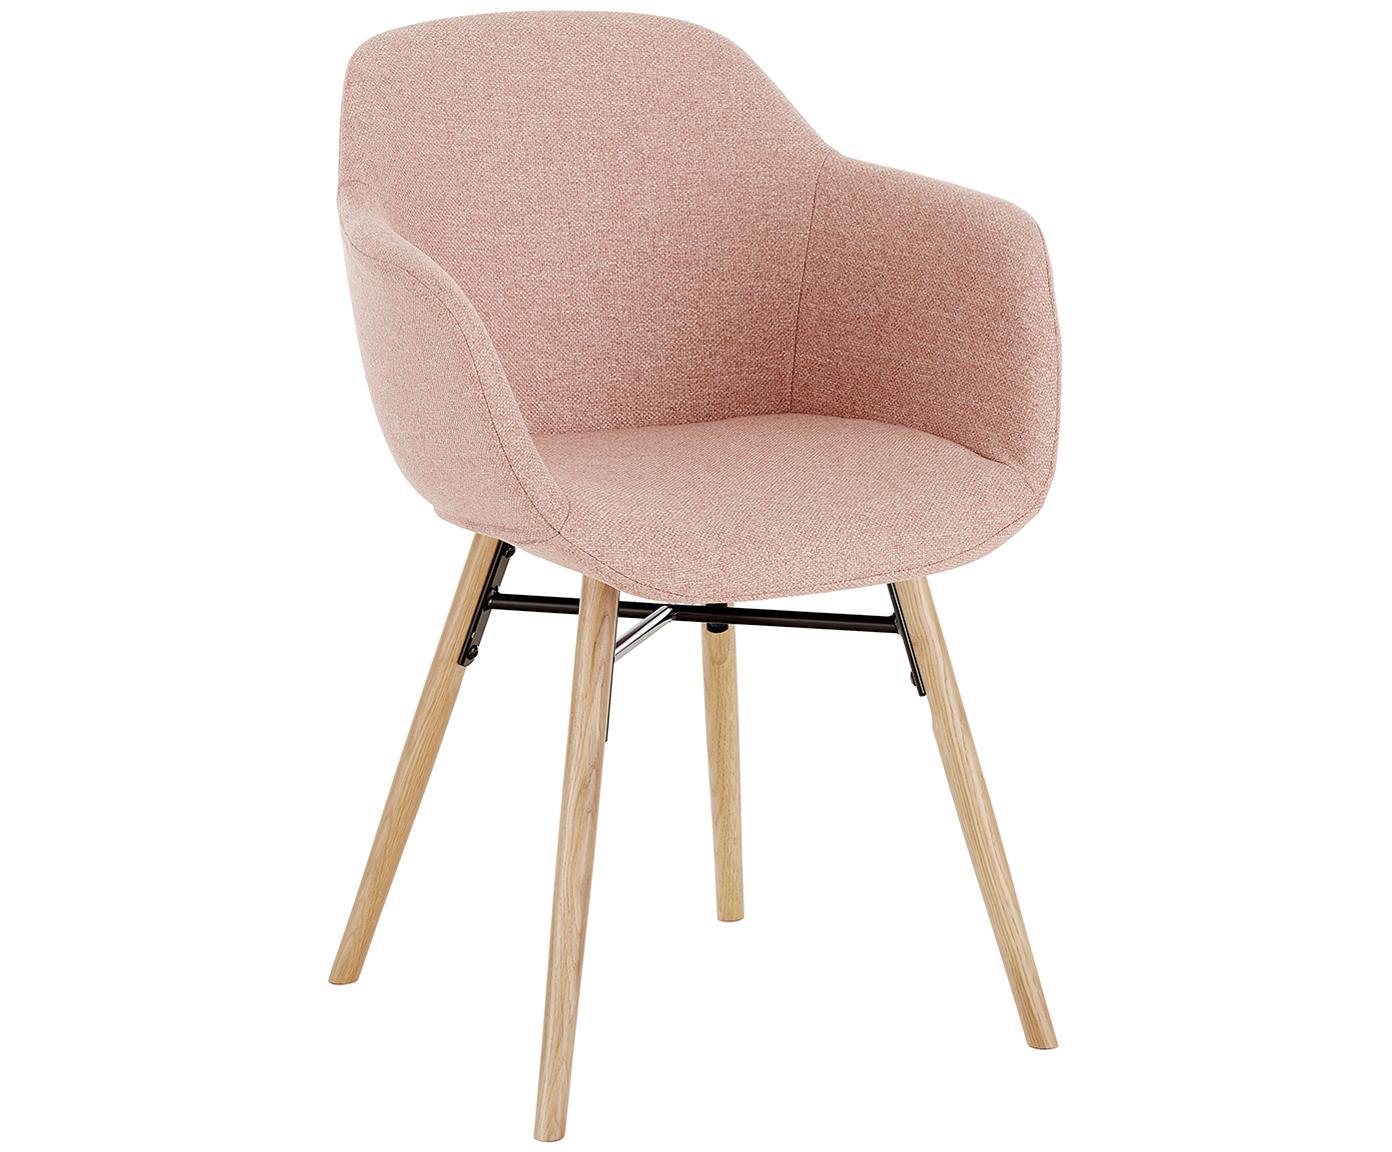 Gestoffeerde stoel Fiji, Bekleding: polyester, Poten: massief eikenhout, Zitvlak: roze Poten: eikenhout, B 59 x D 55 cm